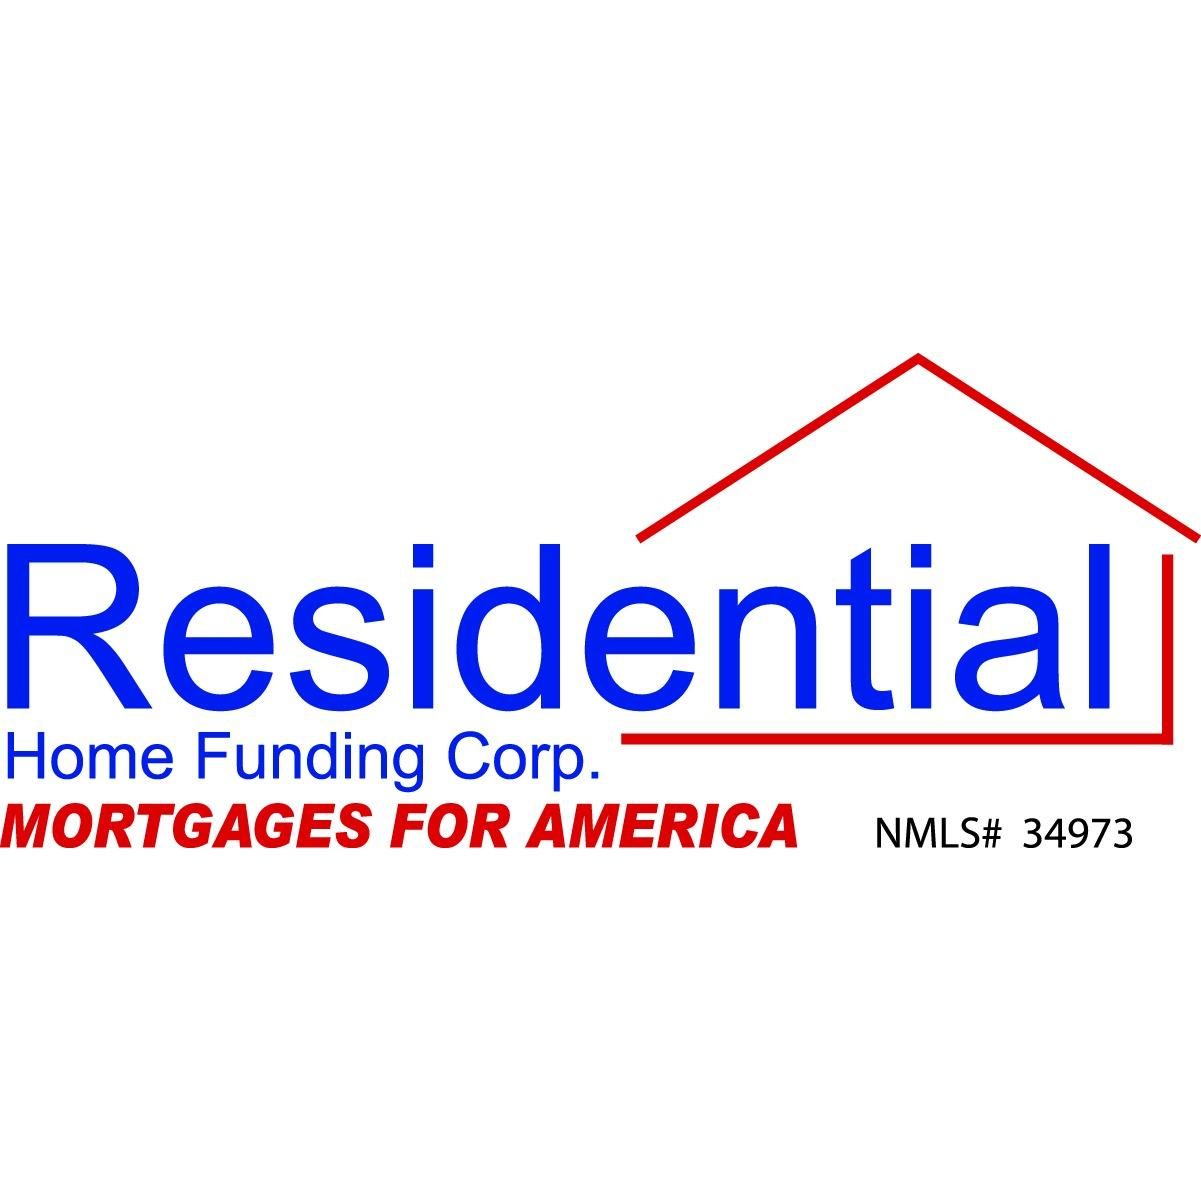 Residential Home Funding